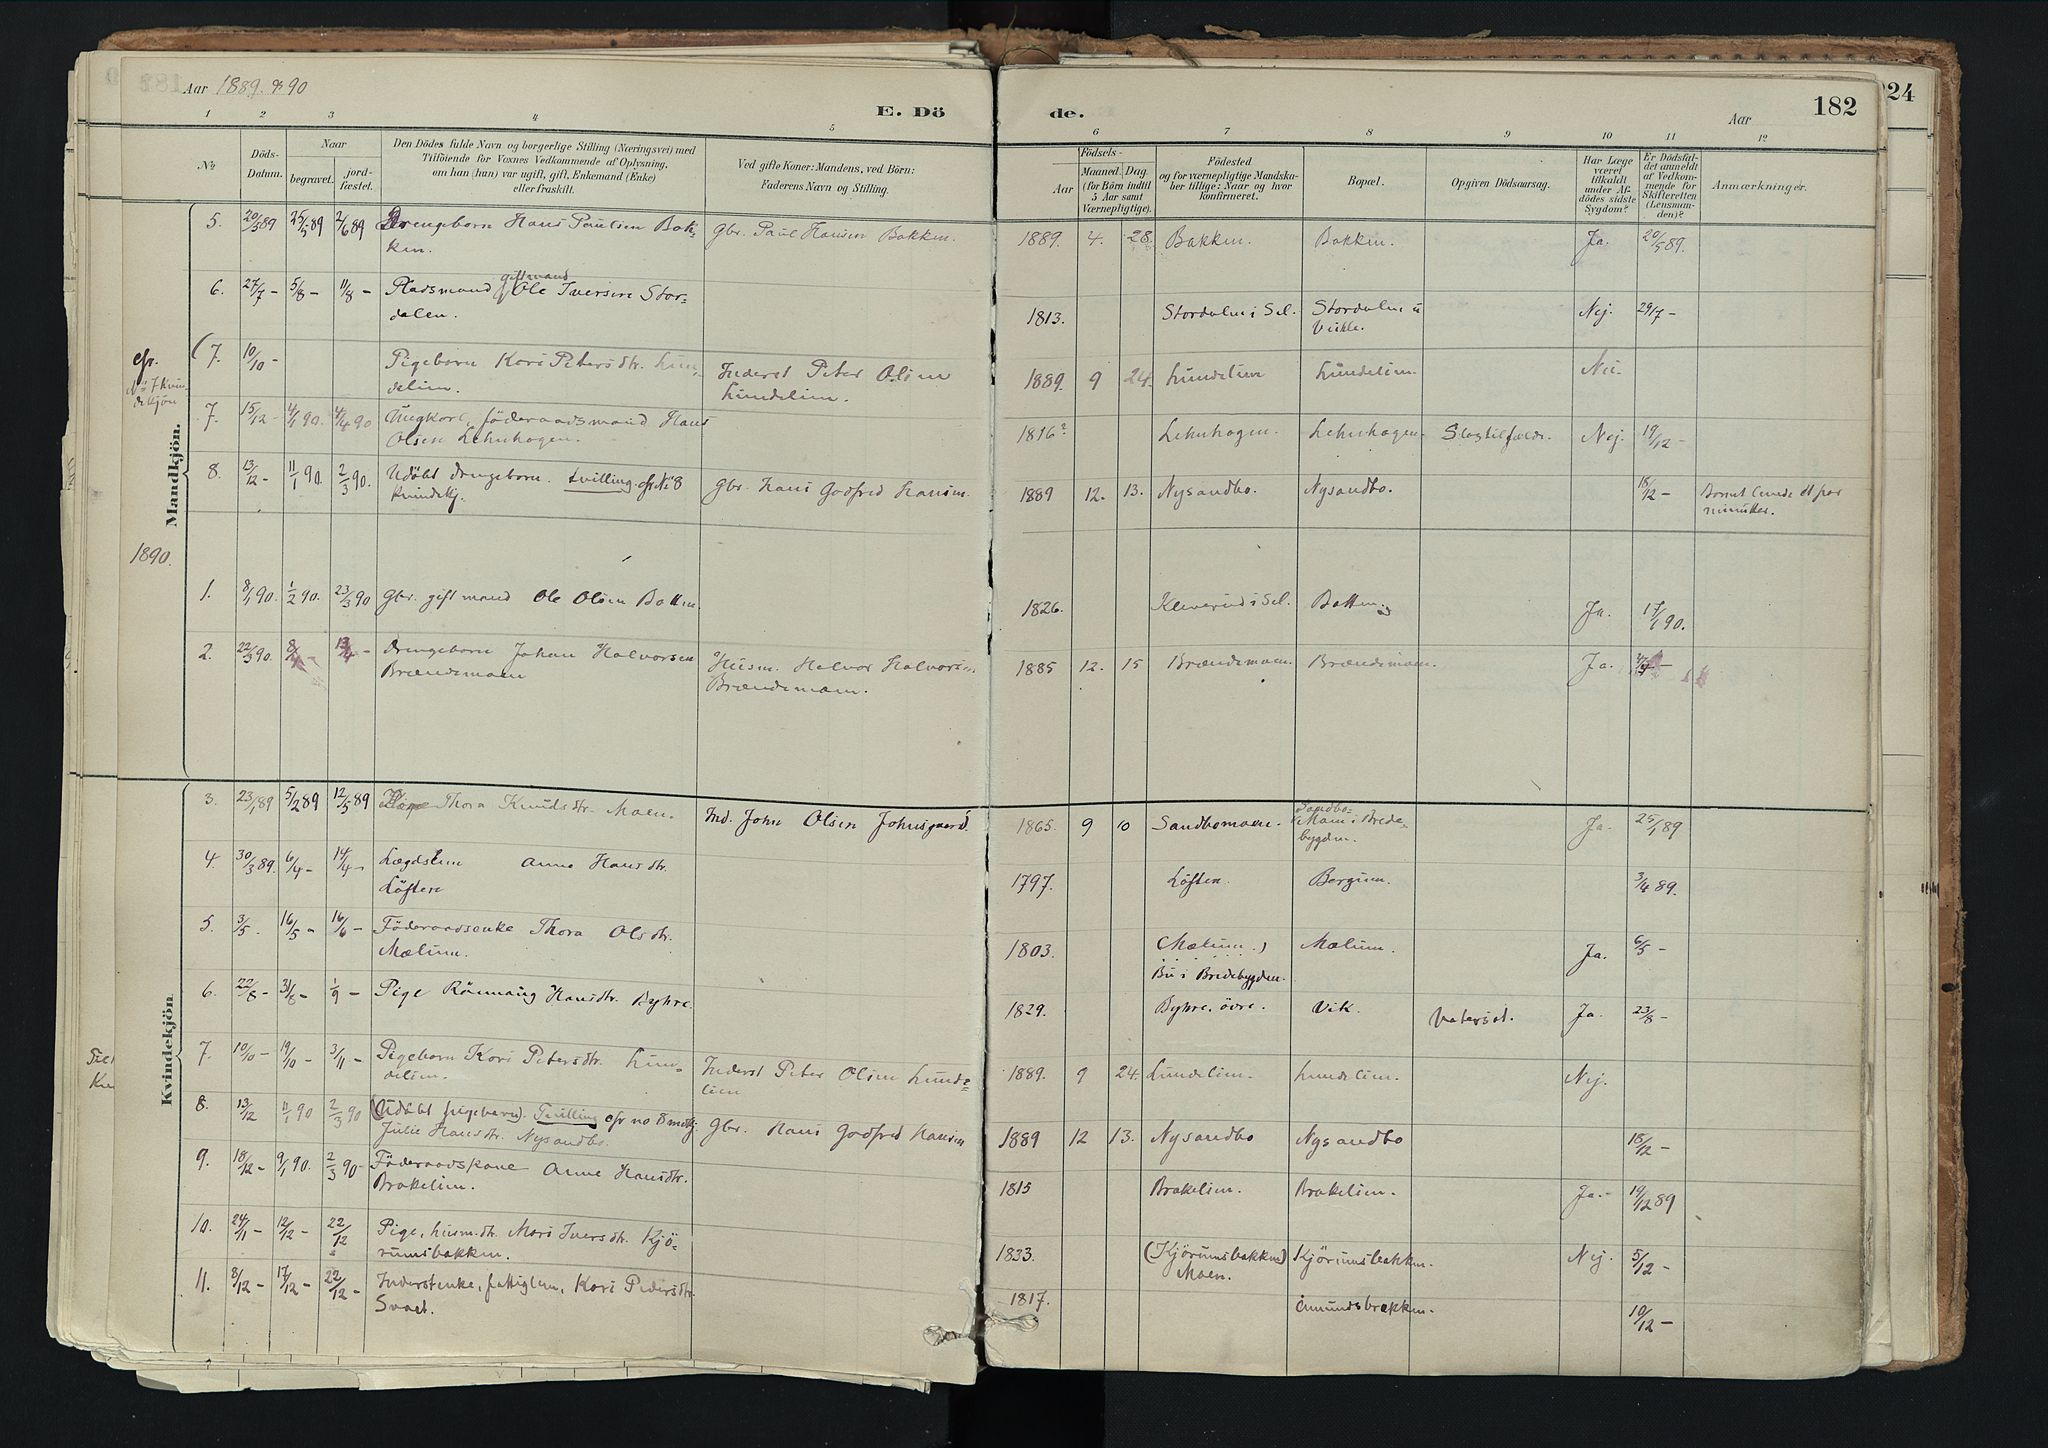 SAH, Nord-Fron prestekontor, Ministerialbok nr. 3, 1884-1914, s. 182